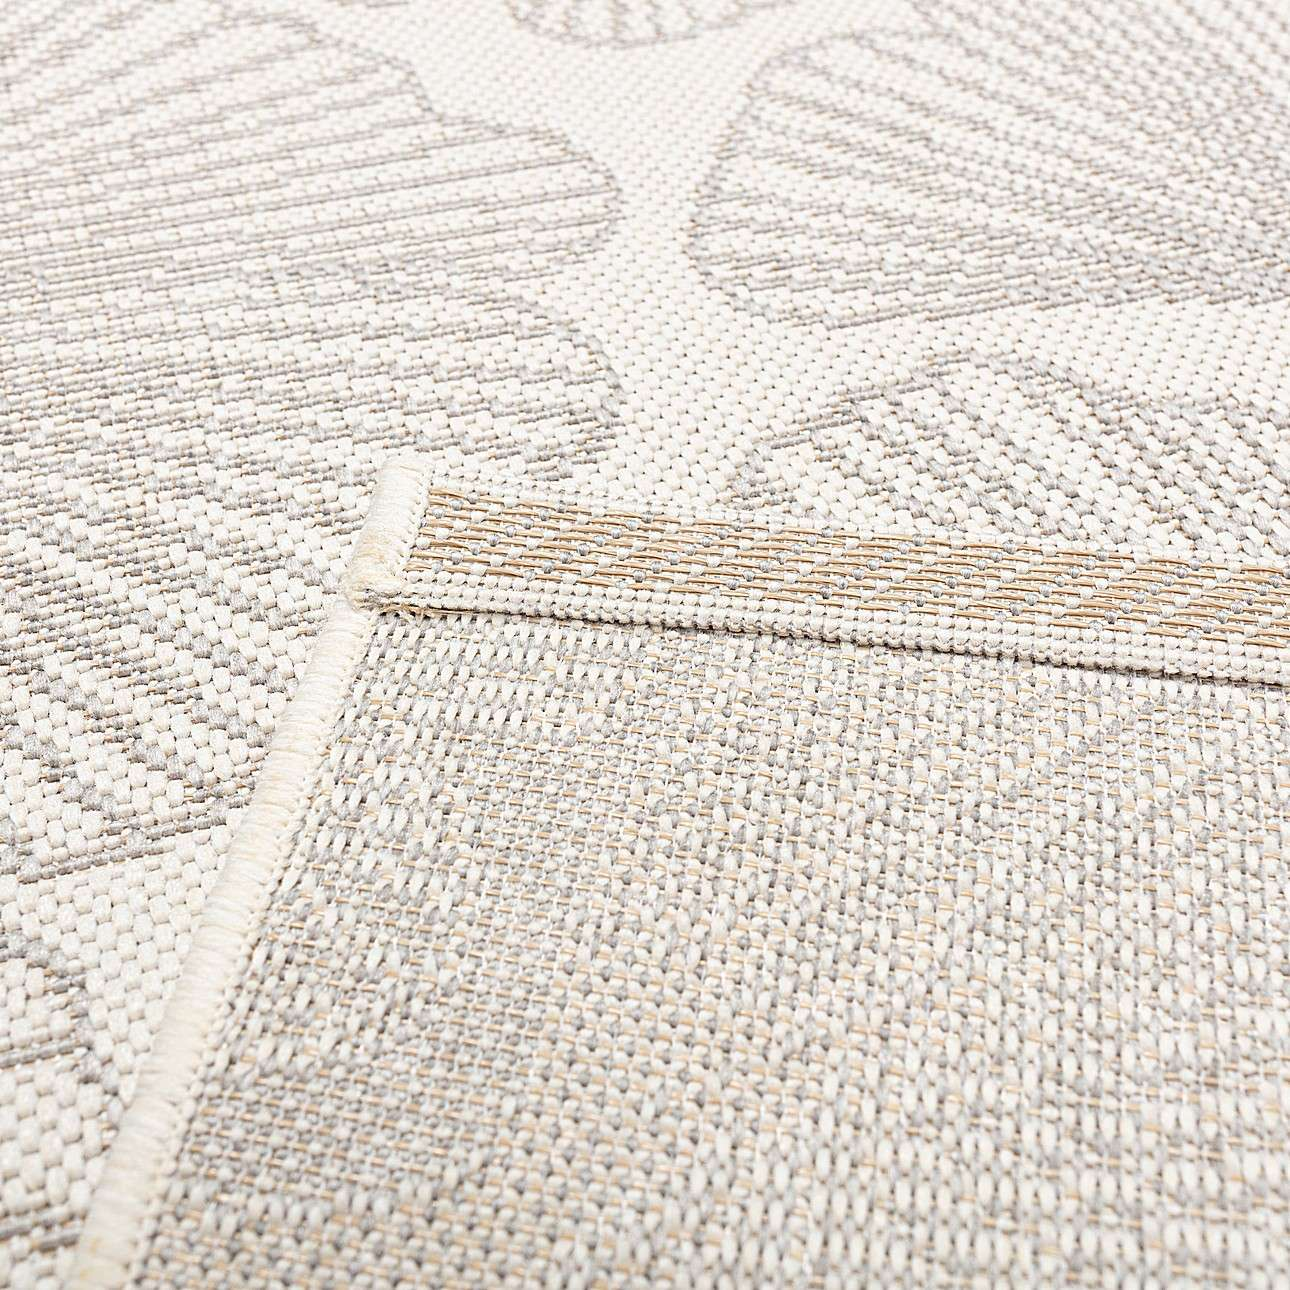 Cottage snow white/silver Rug 120x170cm